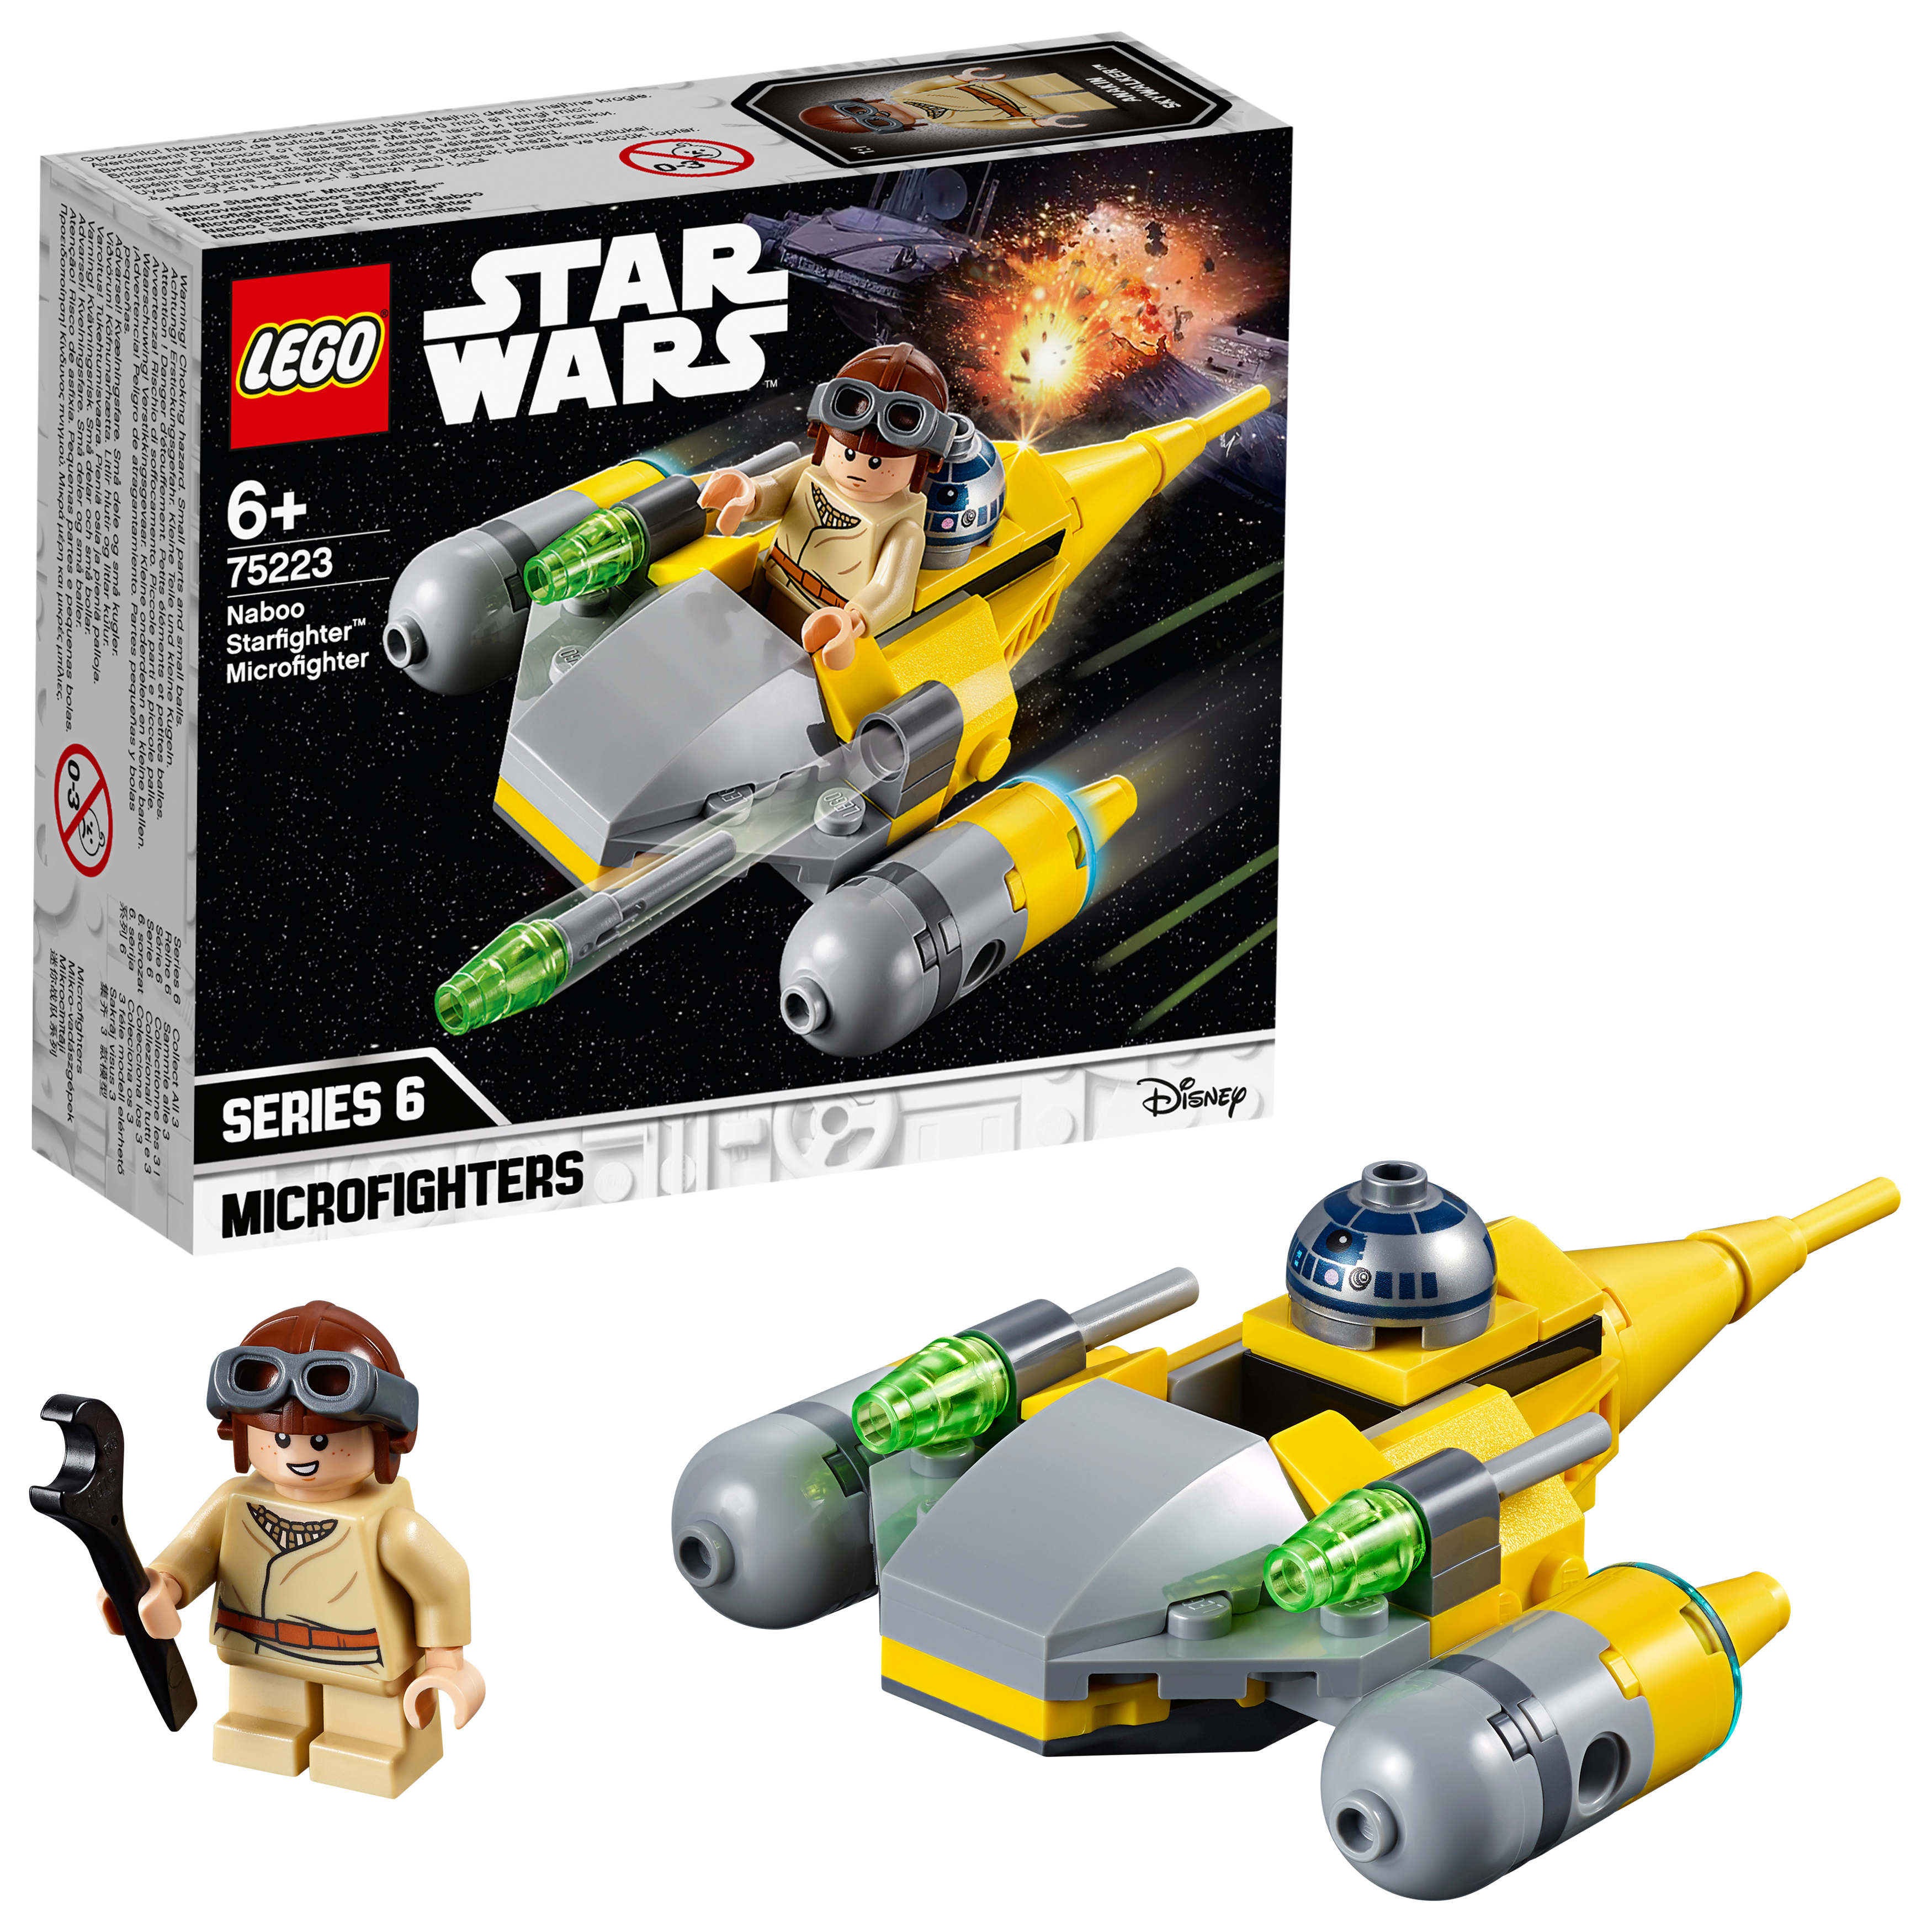 LEGO Star Wars - Naboo Starfighter Microfighter (75223)